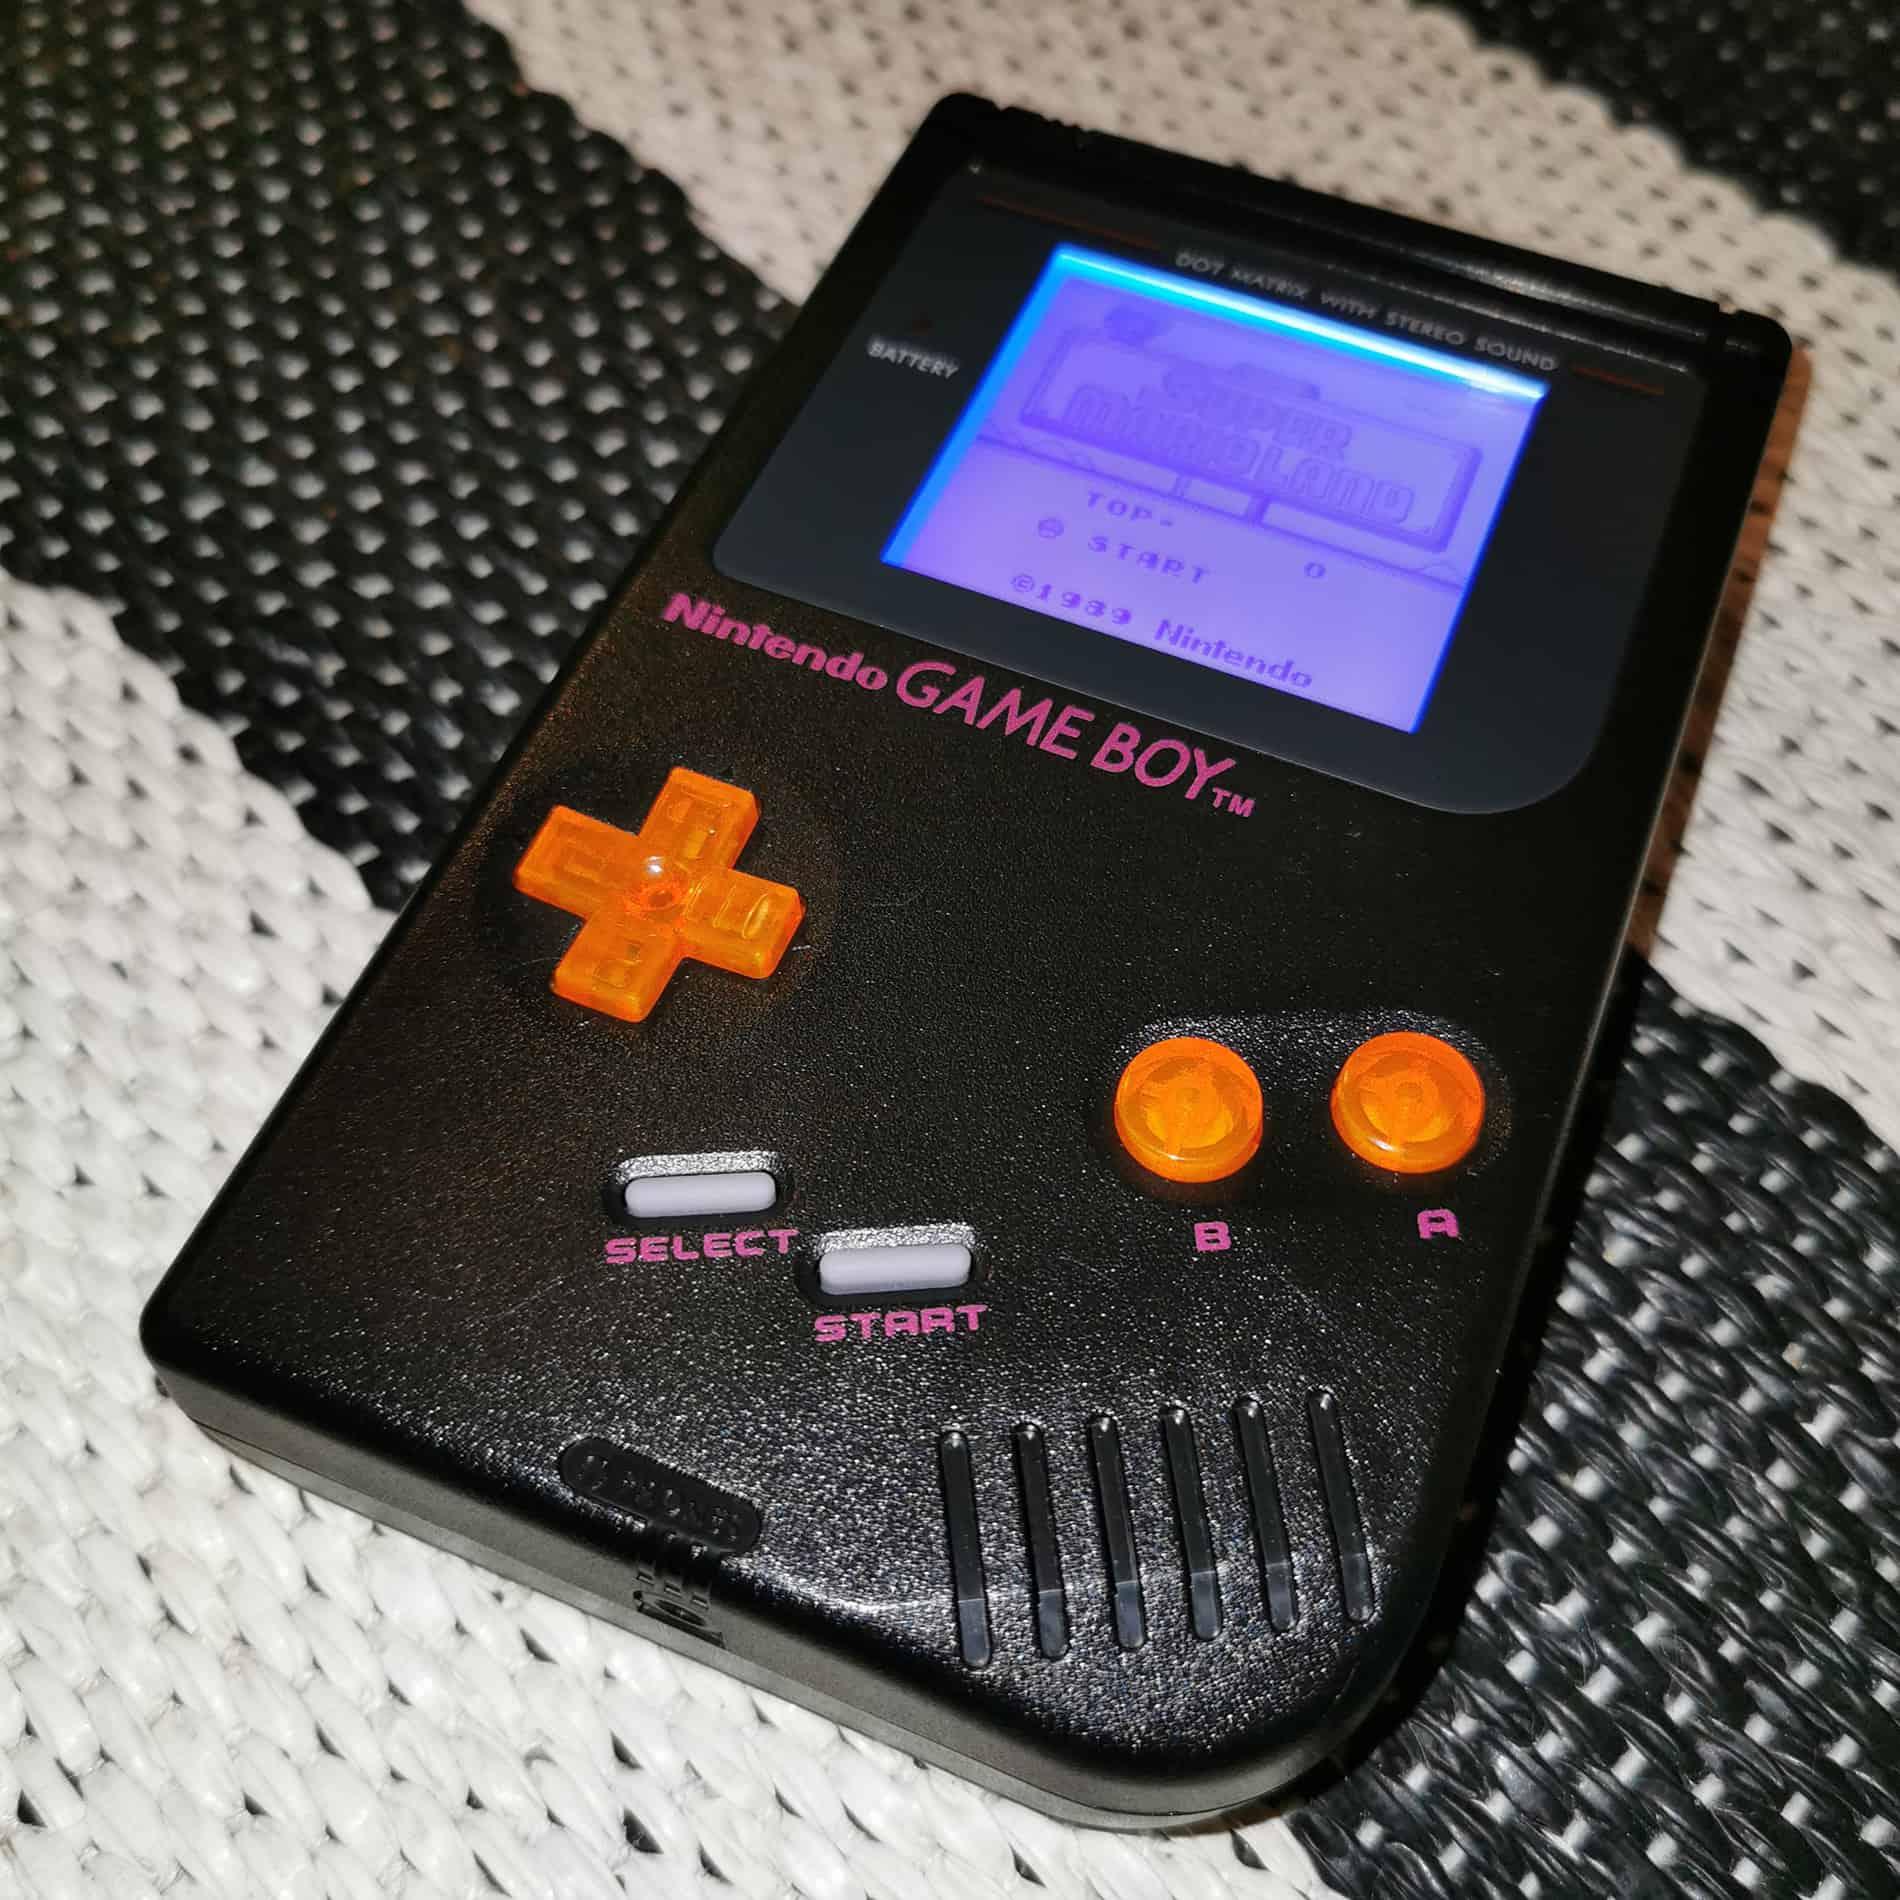 Game Boy DMG-01 Black